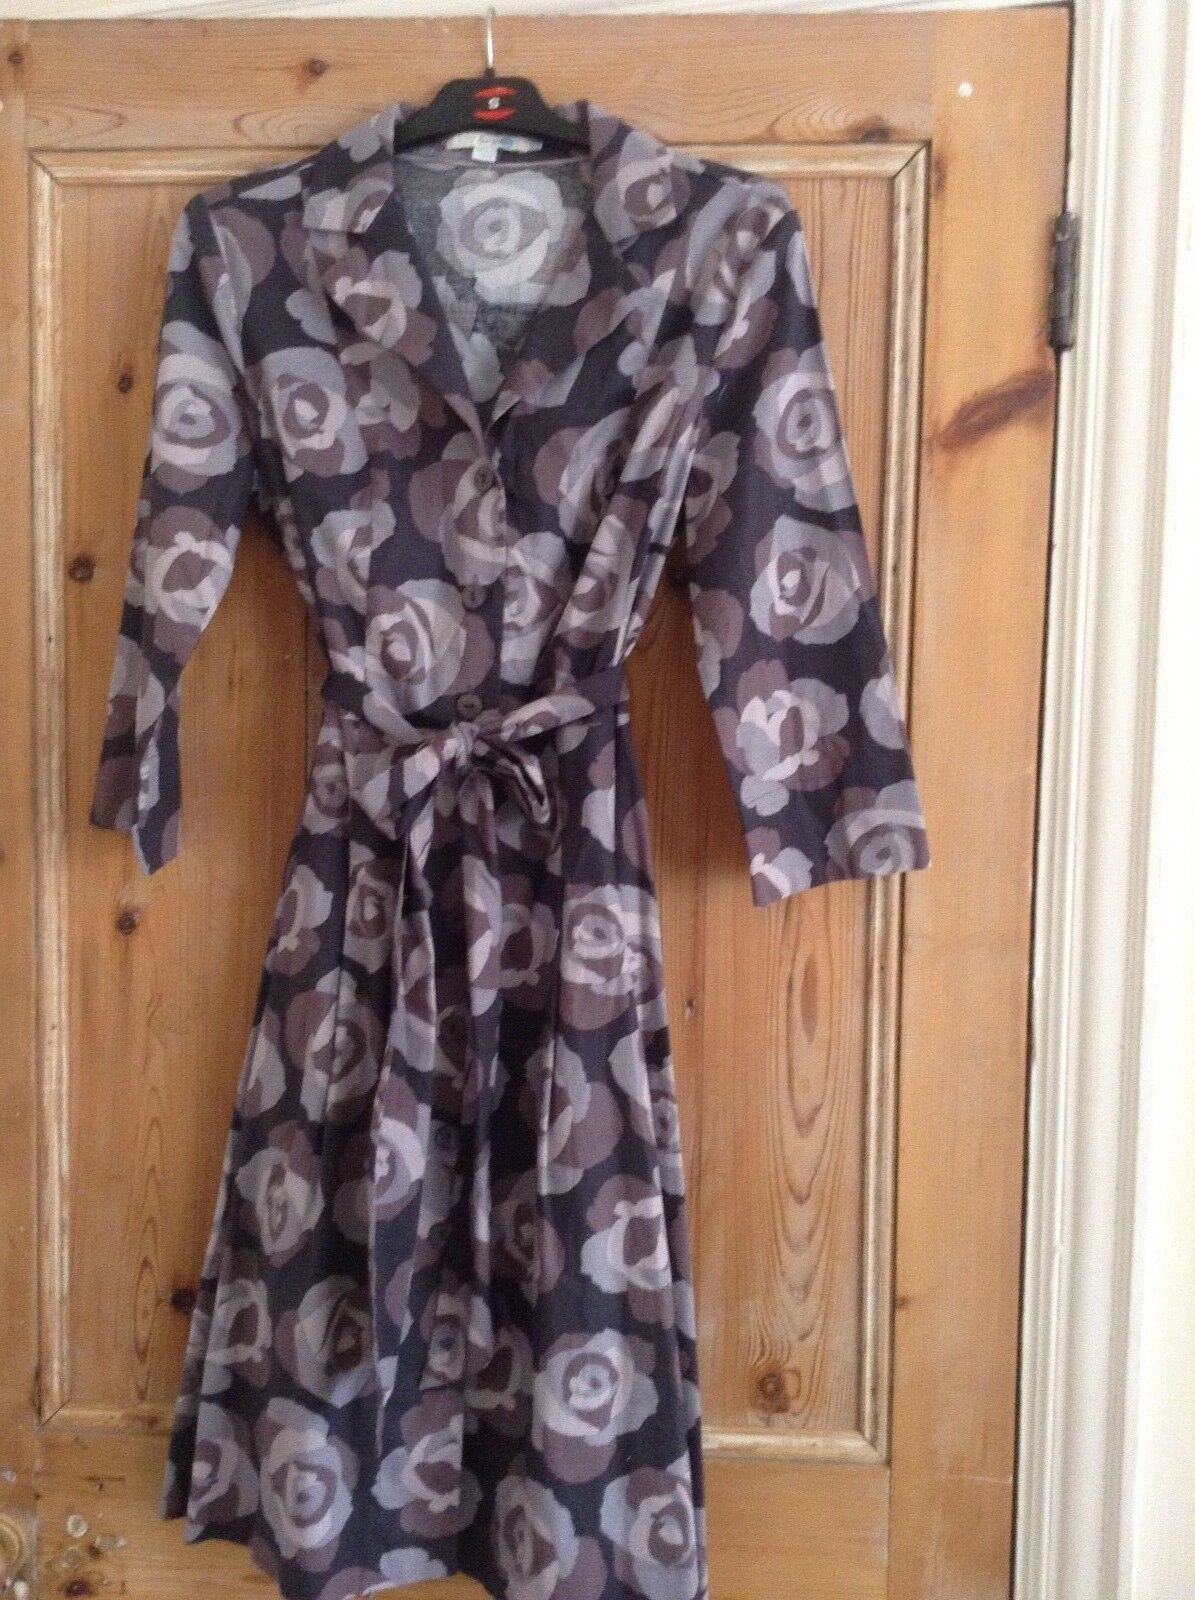 Boden Stunning Floral Dress - Size 12 R